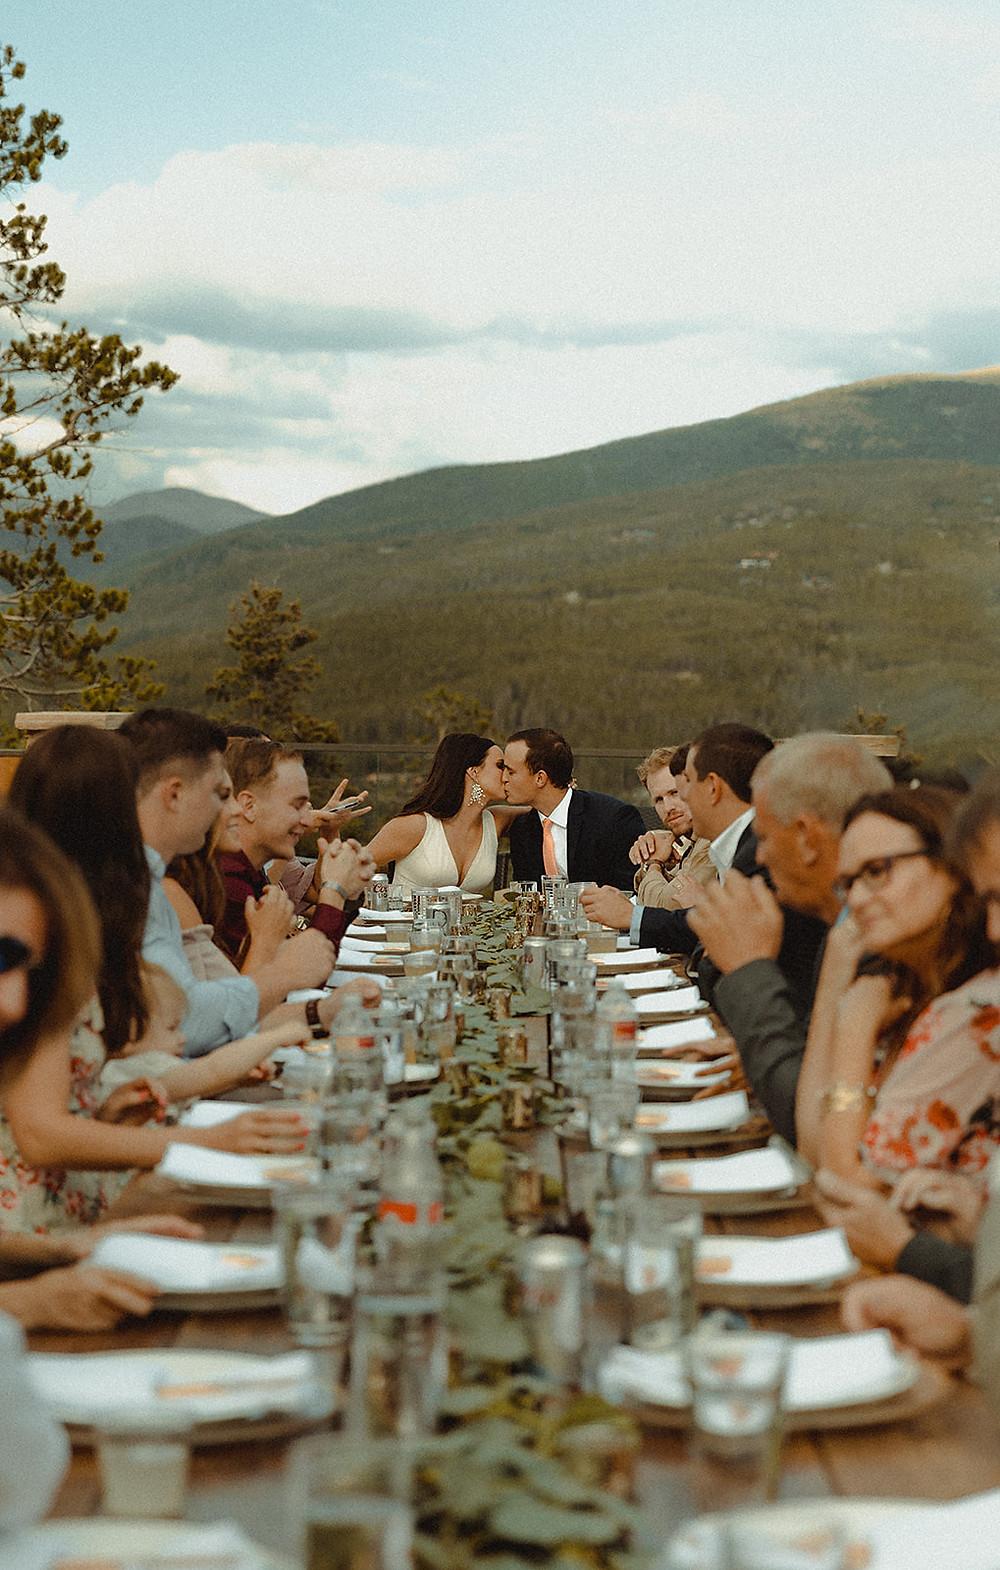 Chateau of Breckenridge Wedding - Breckenridge Wedding - Wedding Dinner